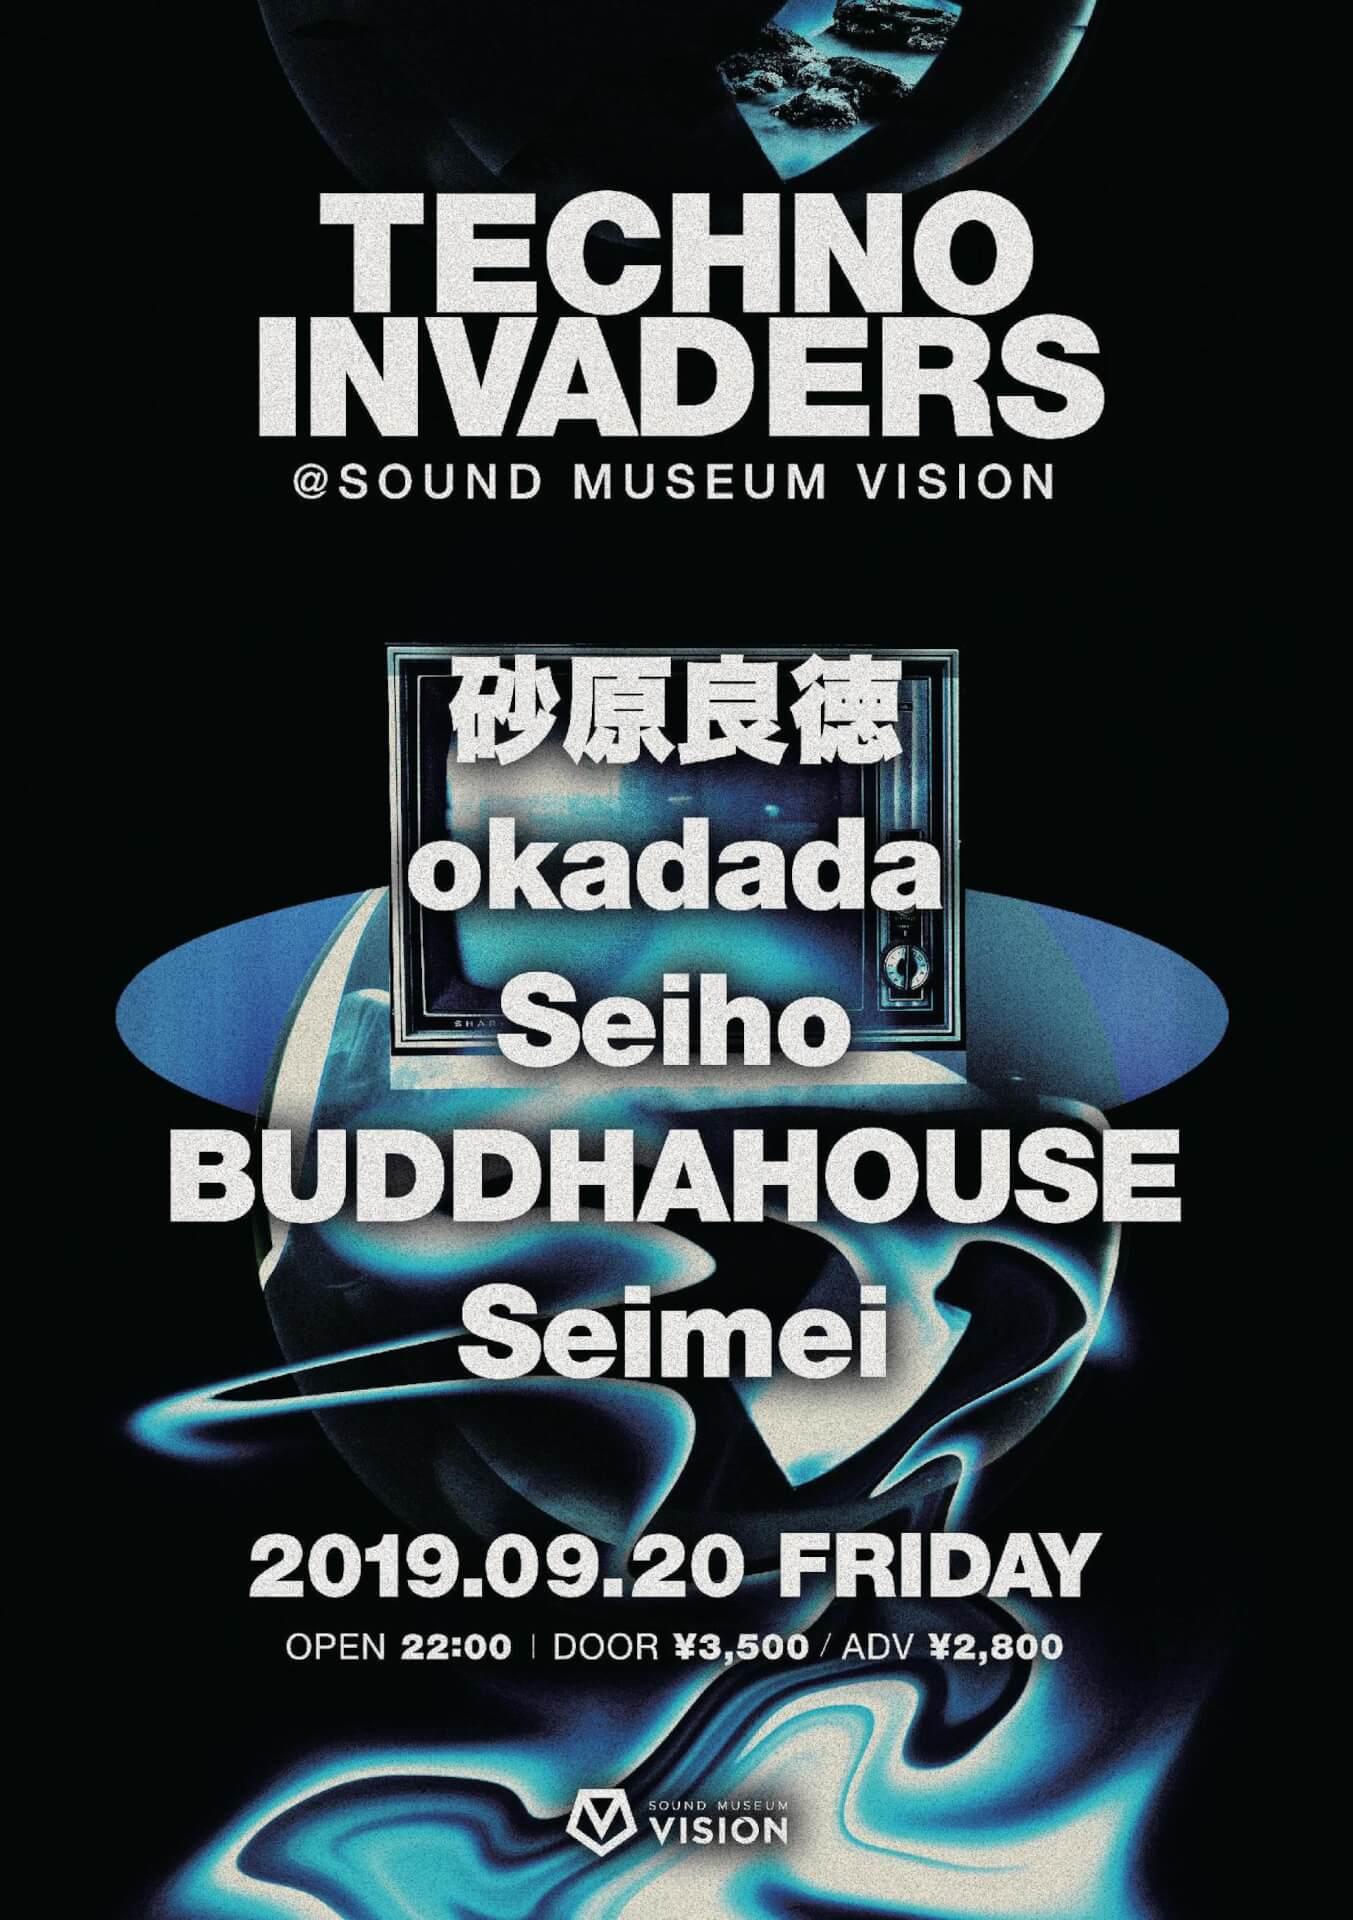 VISIONの恒例テクノイベント<TECHNO INVADERS>に砂原良徳、okadada、Seihoが登場! music190920_vision_technoinvader_1